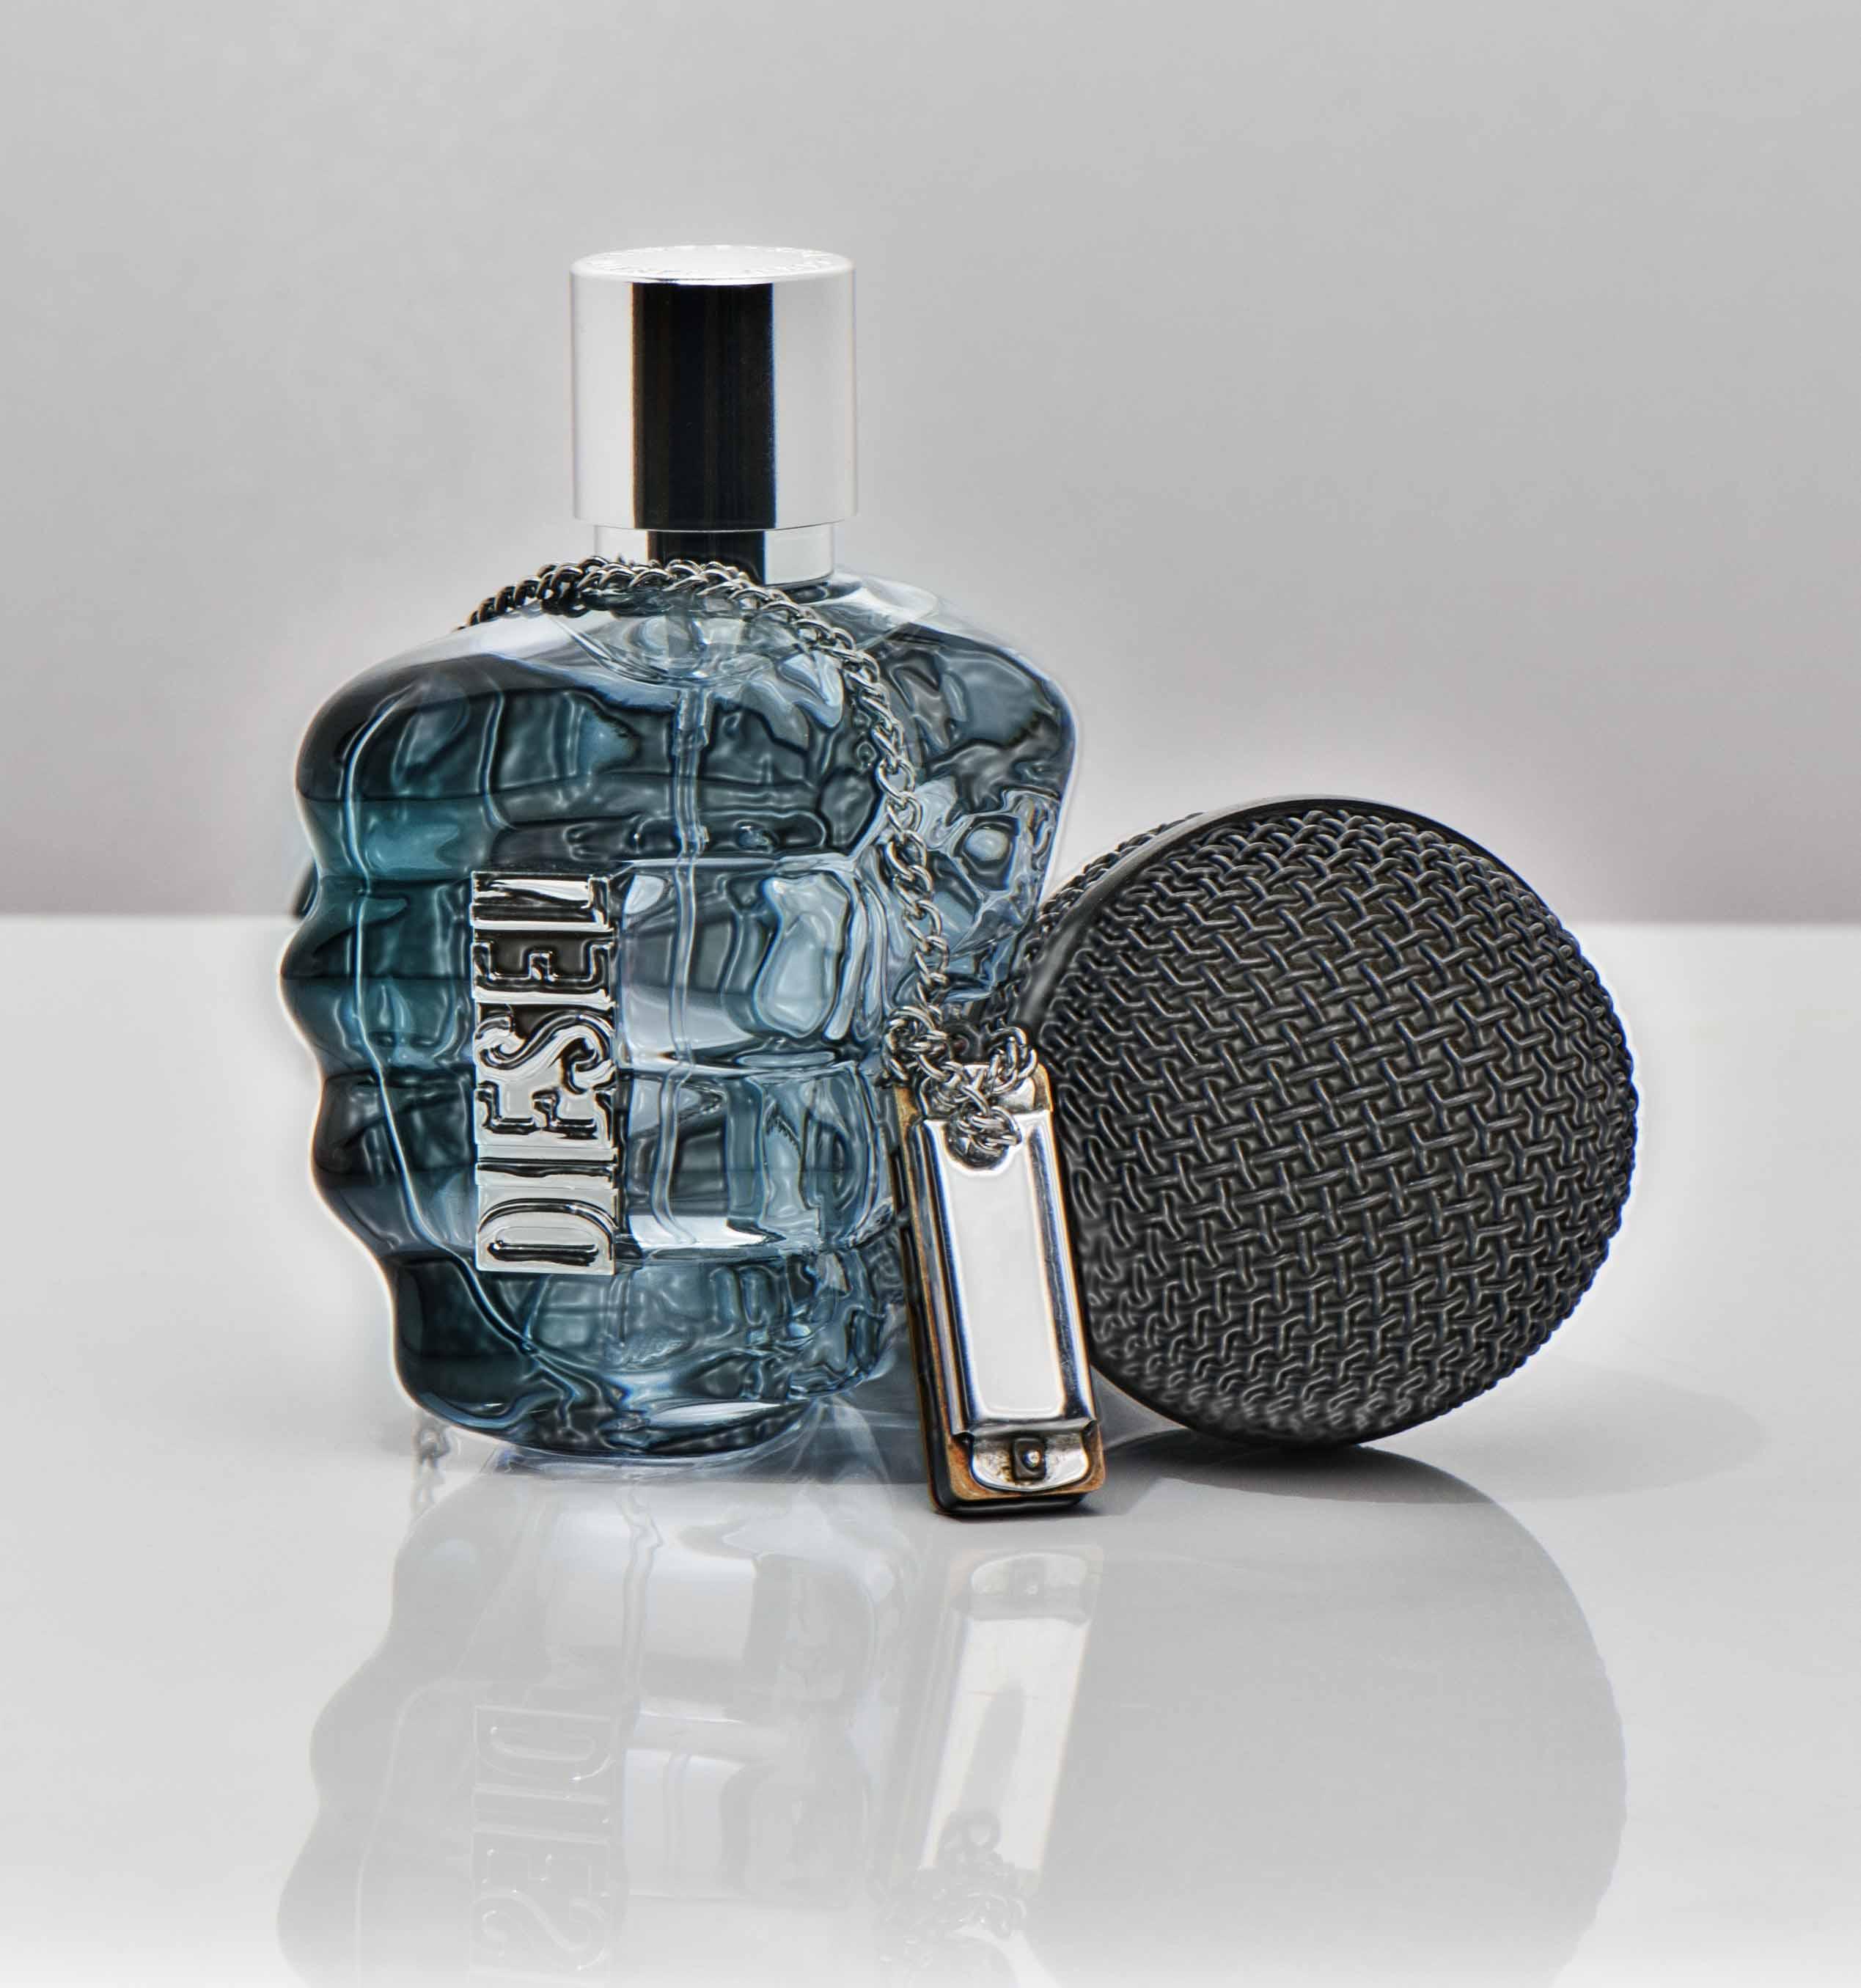 perfume-034.jpg